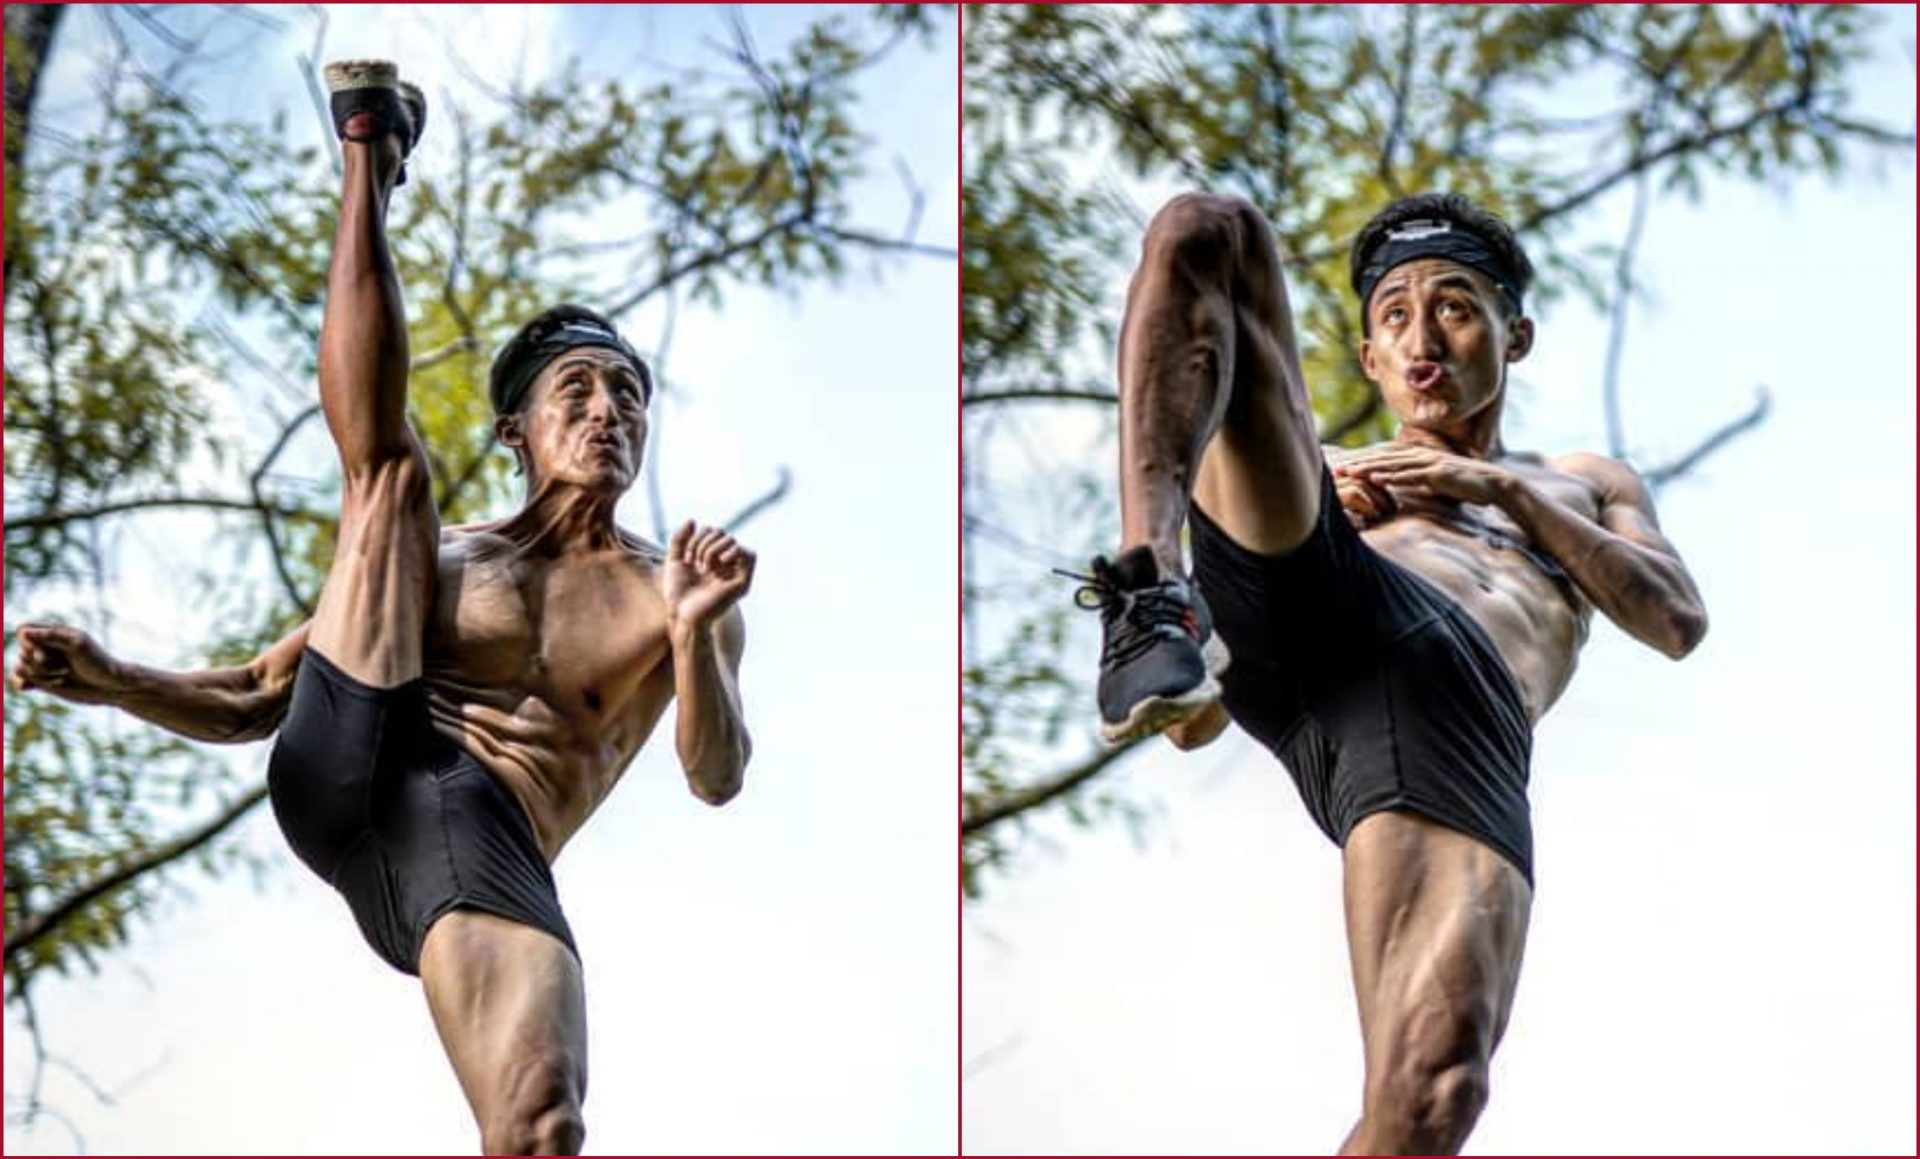 Meet Neitso Angami, who wants to honor his father's memory through MMA - Neitso Angami